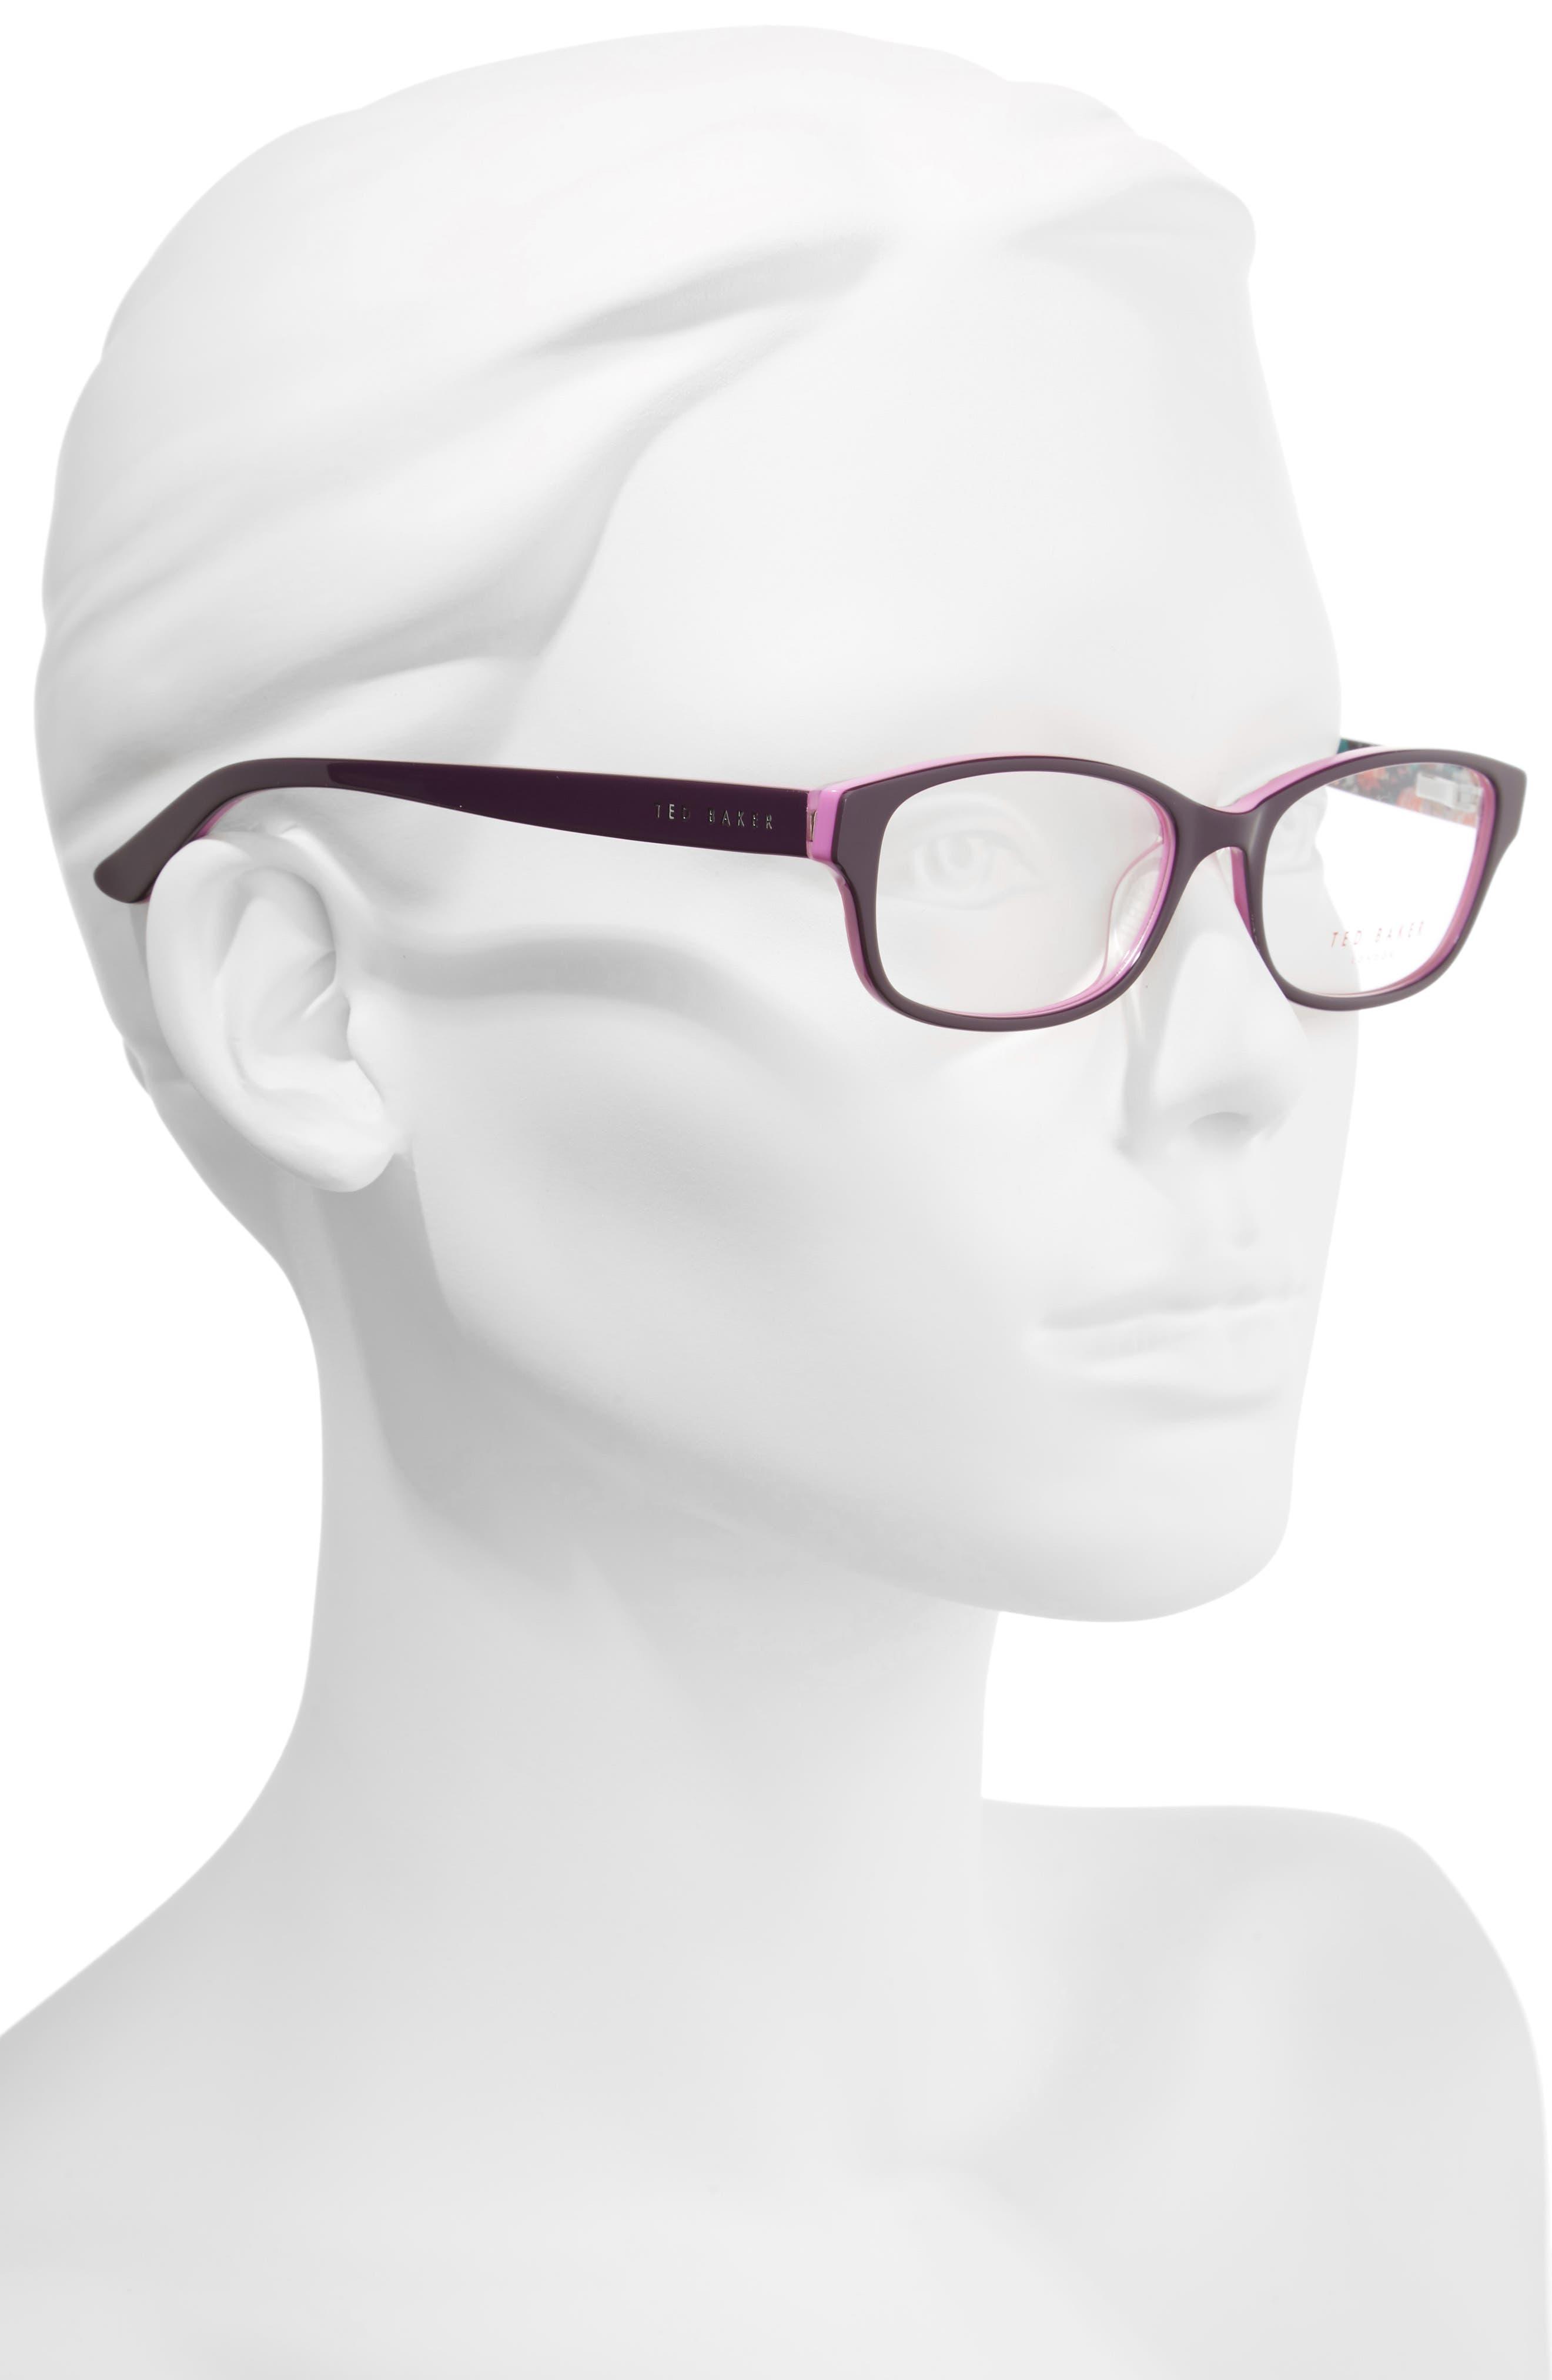 53mm Optical Glasses,                             Alternate thumbnail 2, color,                             Purple